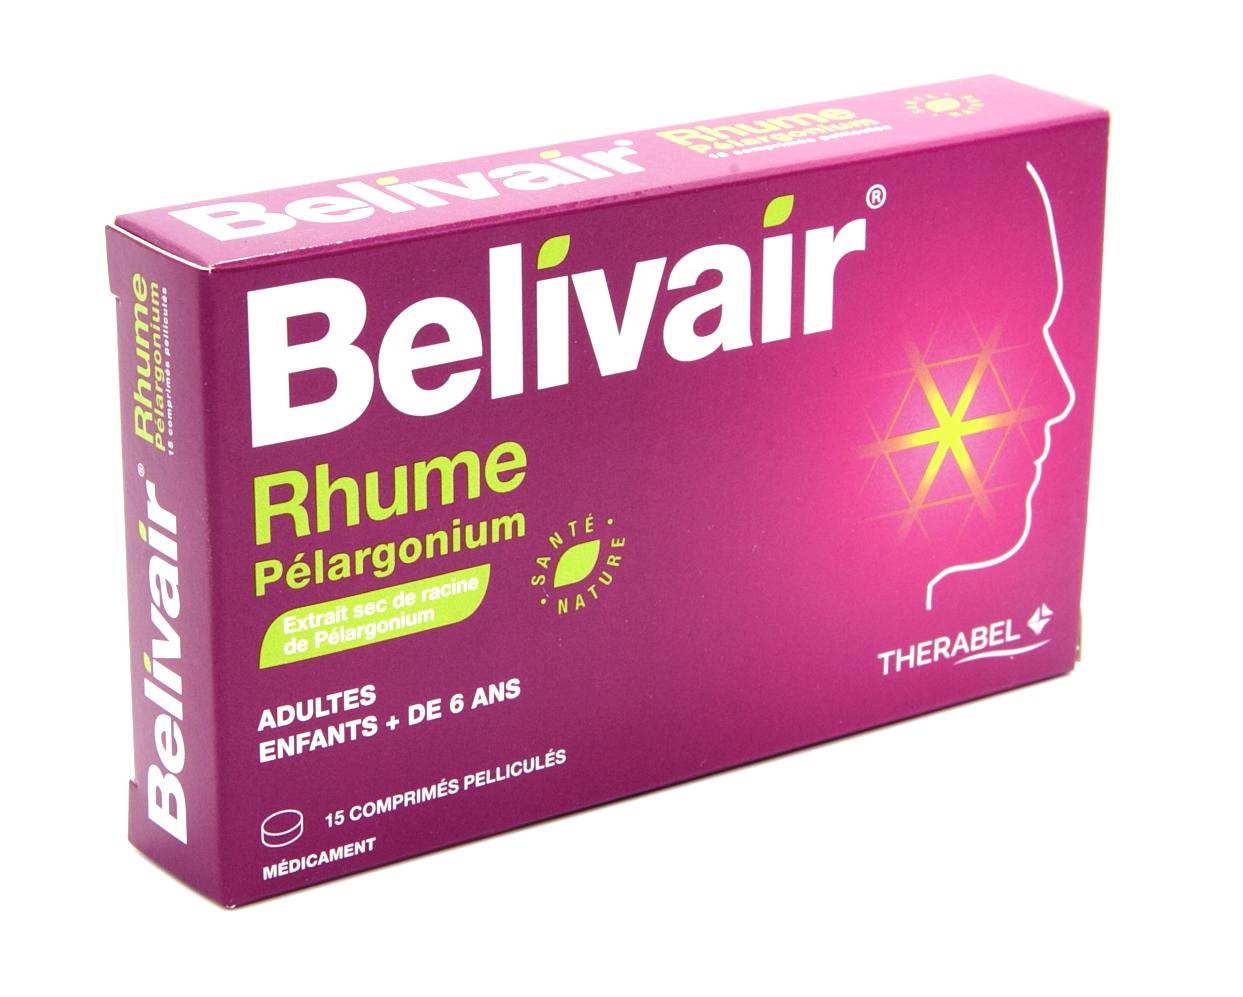 VIDAL - BELIVAIR RHUME PELARGONIUM cp pellic - Synthèse